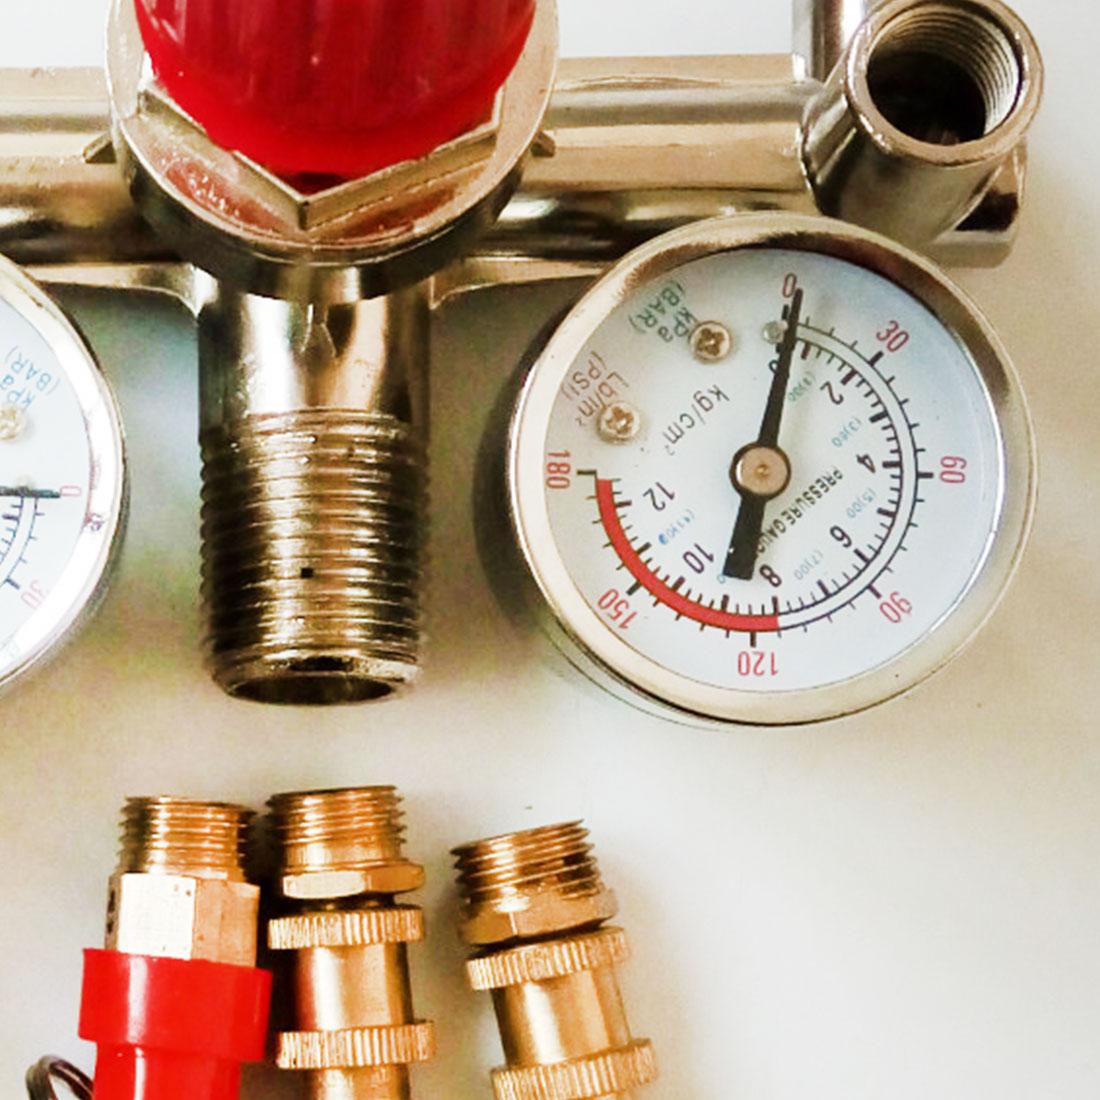 4 Port Air Pump Control Valve Regulator Heavy Duty Air Compressor Pump Pressure Control Switch 7.25-125 PSI with Gauge4 Port Air Pump Control Valve Regulator Heavy Duty Air Compressor Pump Pressure Control Switch 7.25-125 PSI with Gauge